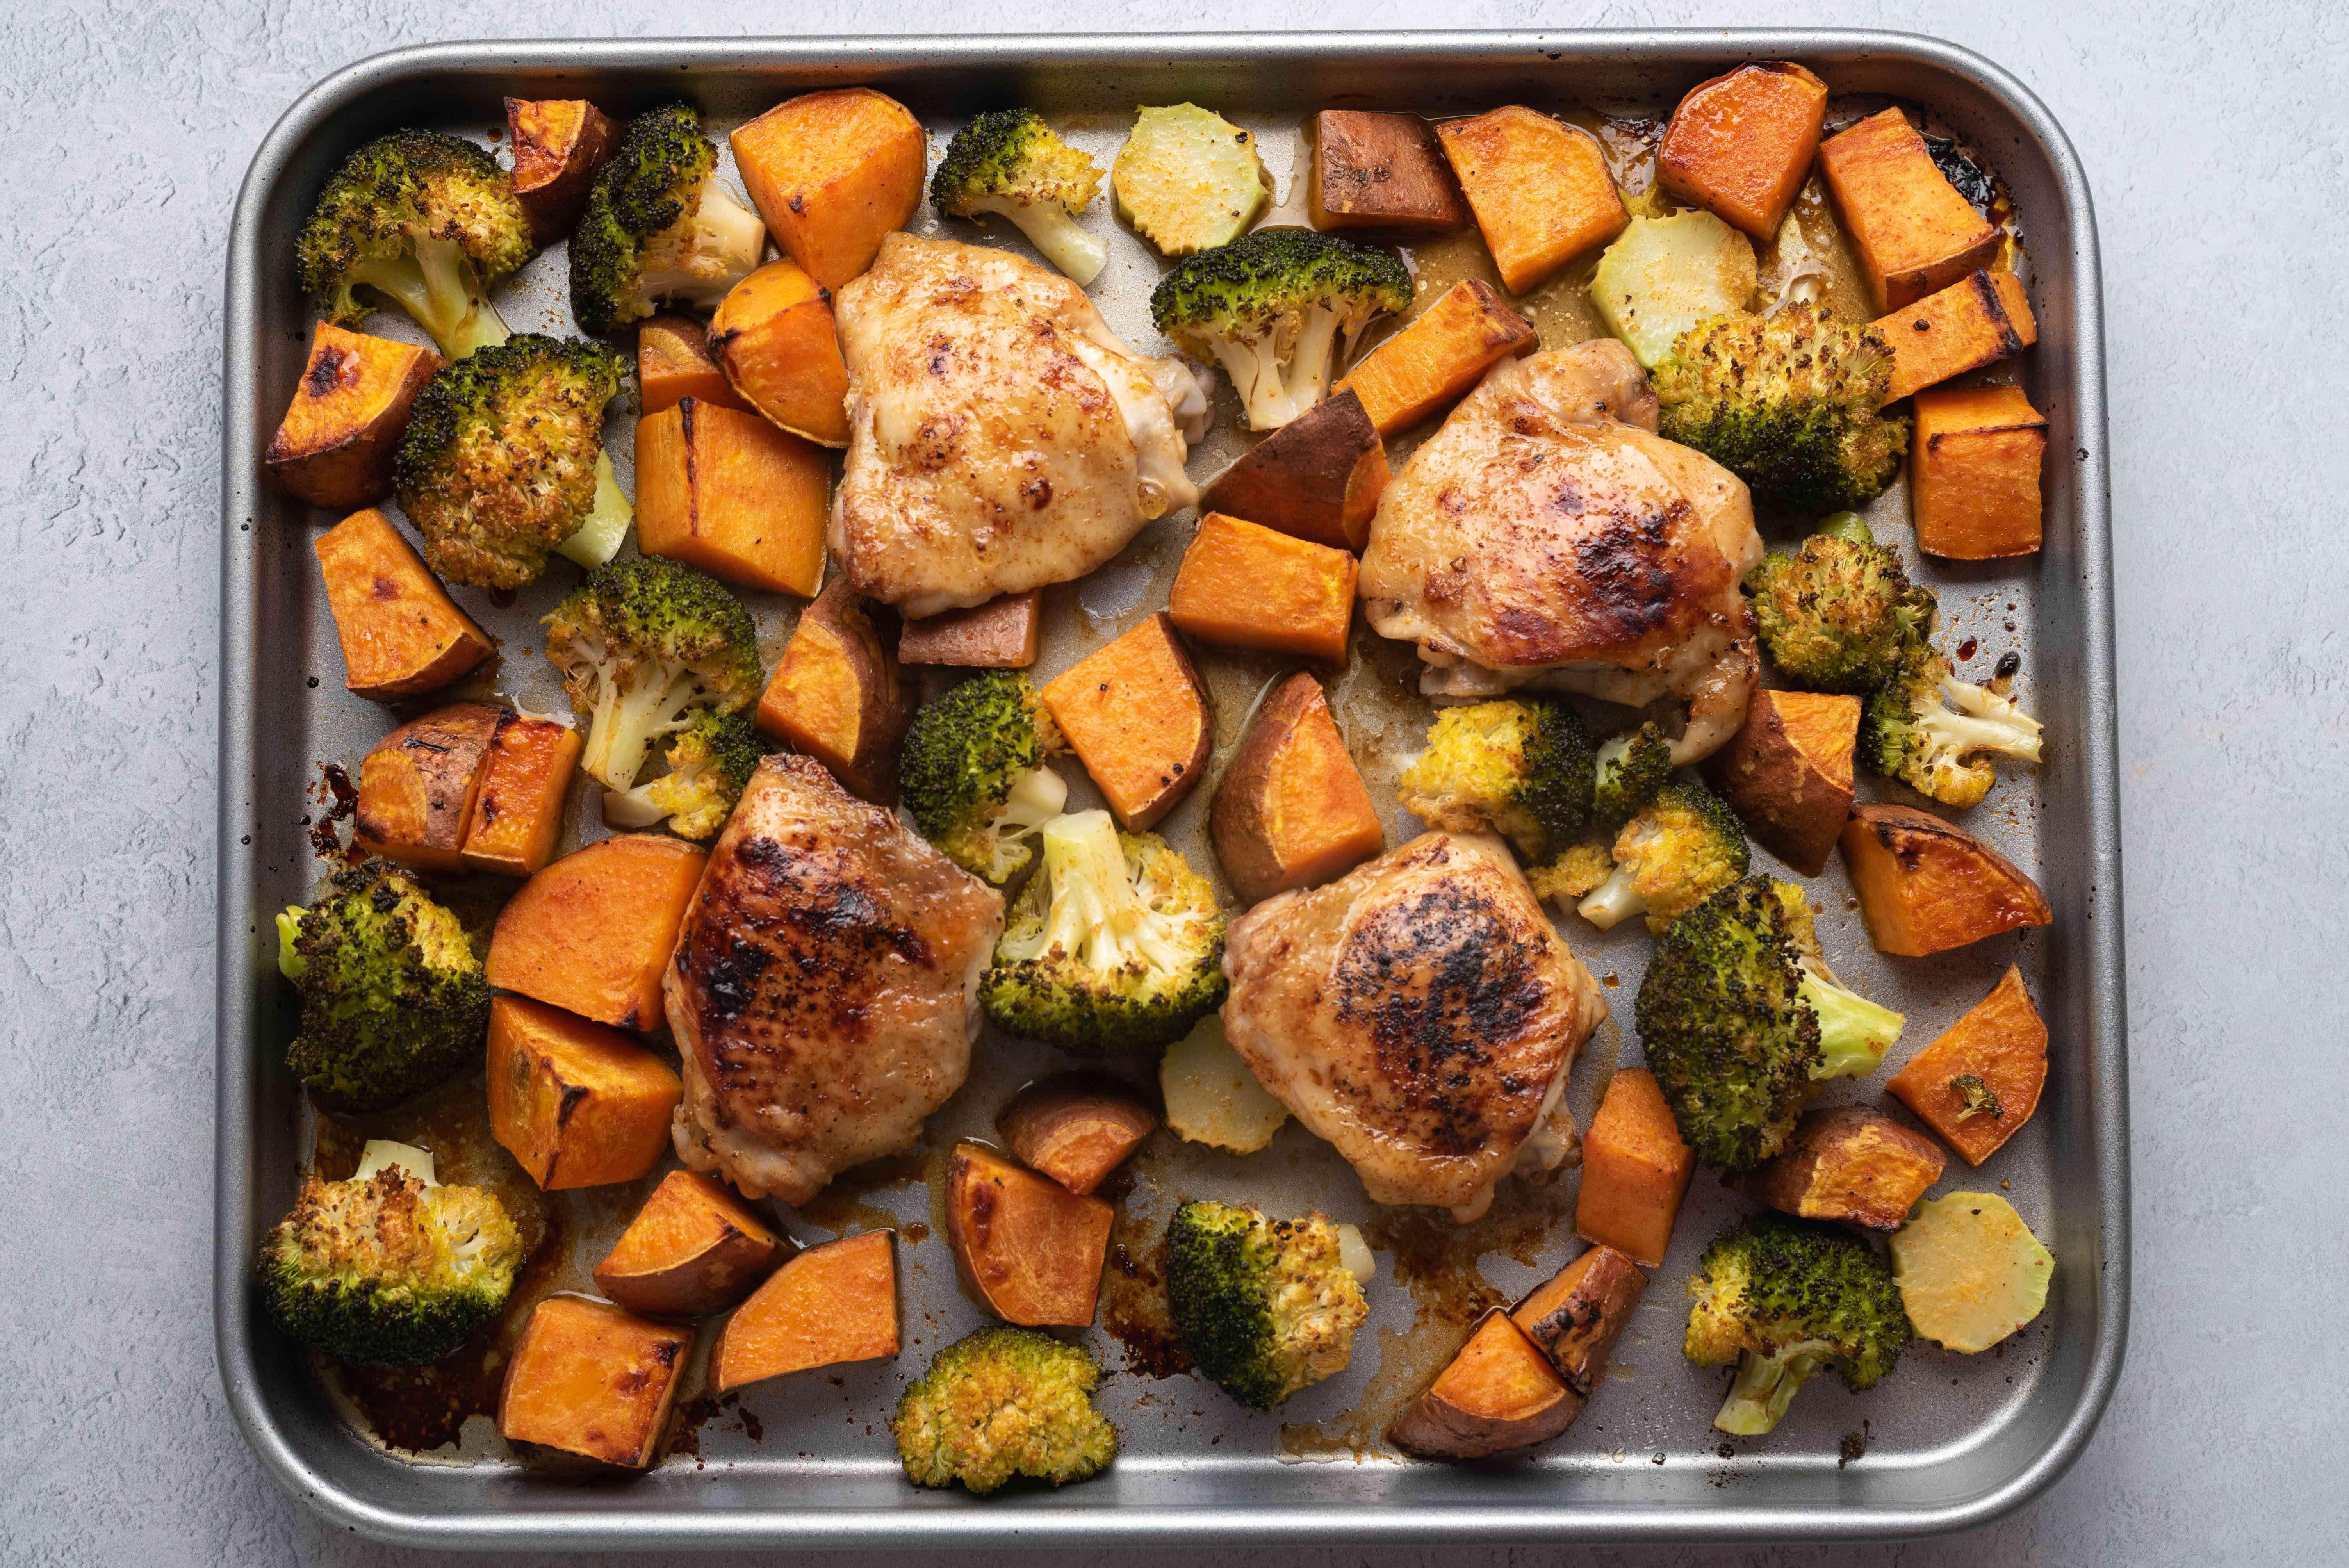 Roasted Sheet Pan Chicken, Sweet Potatoes, and Broccoli on a sheet pan